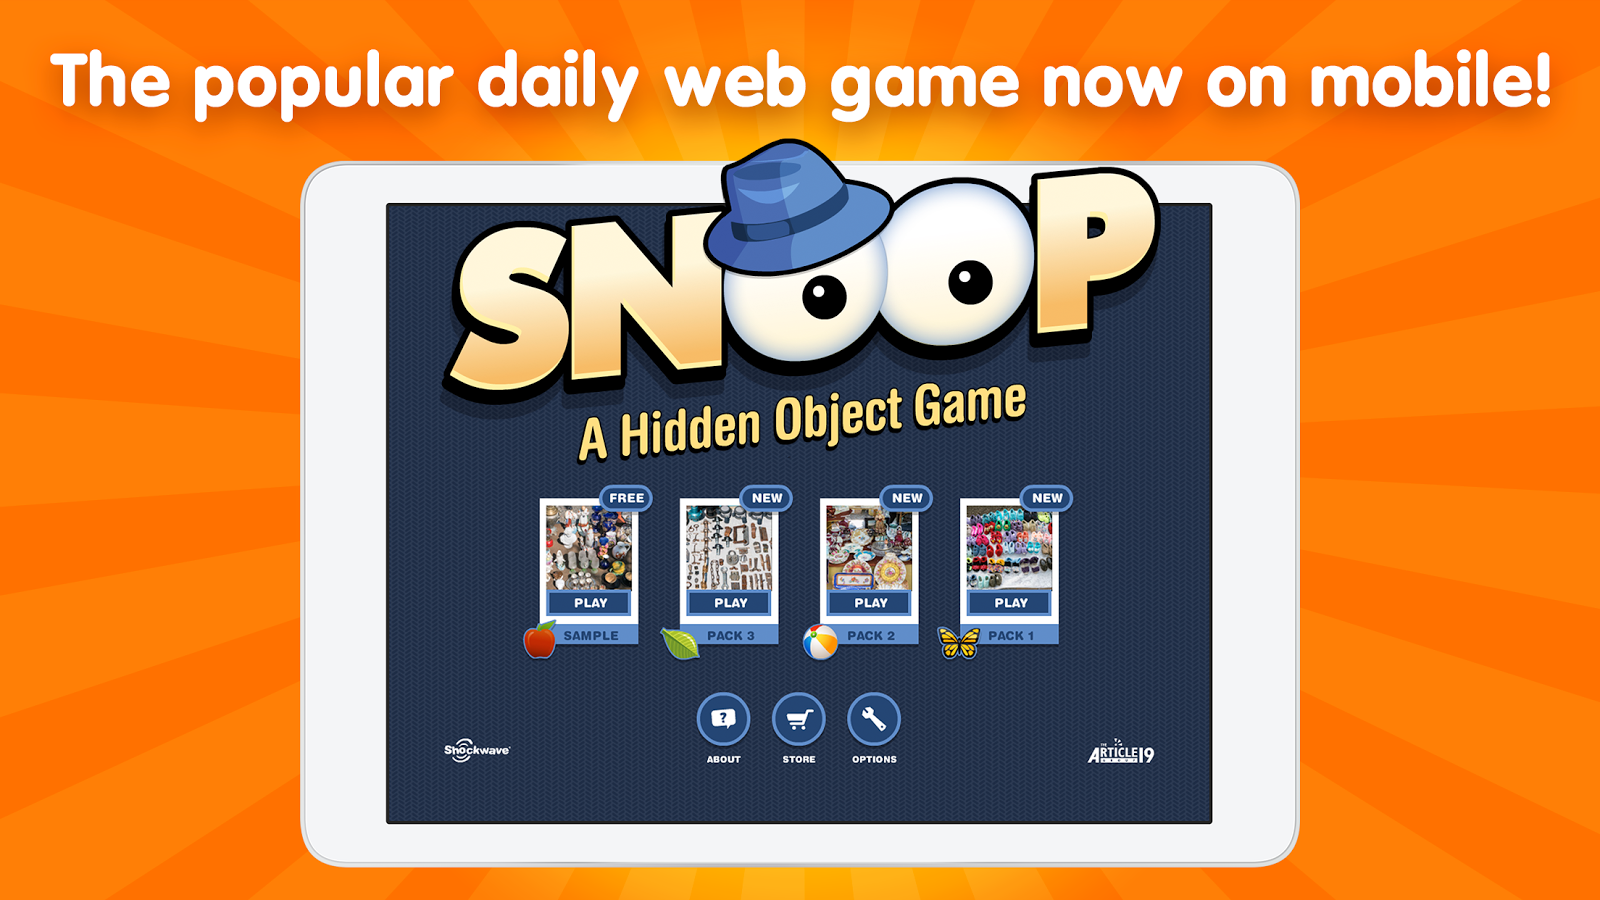 hidden object games shockwave daily snoop